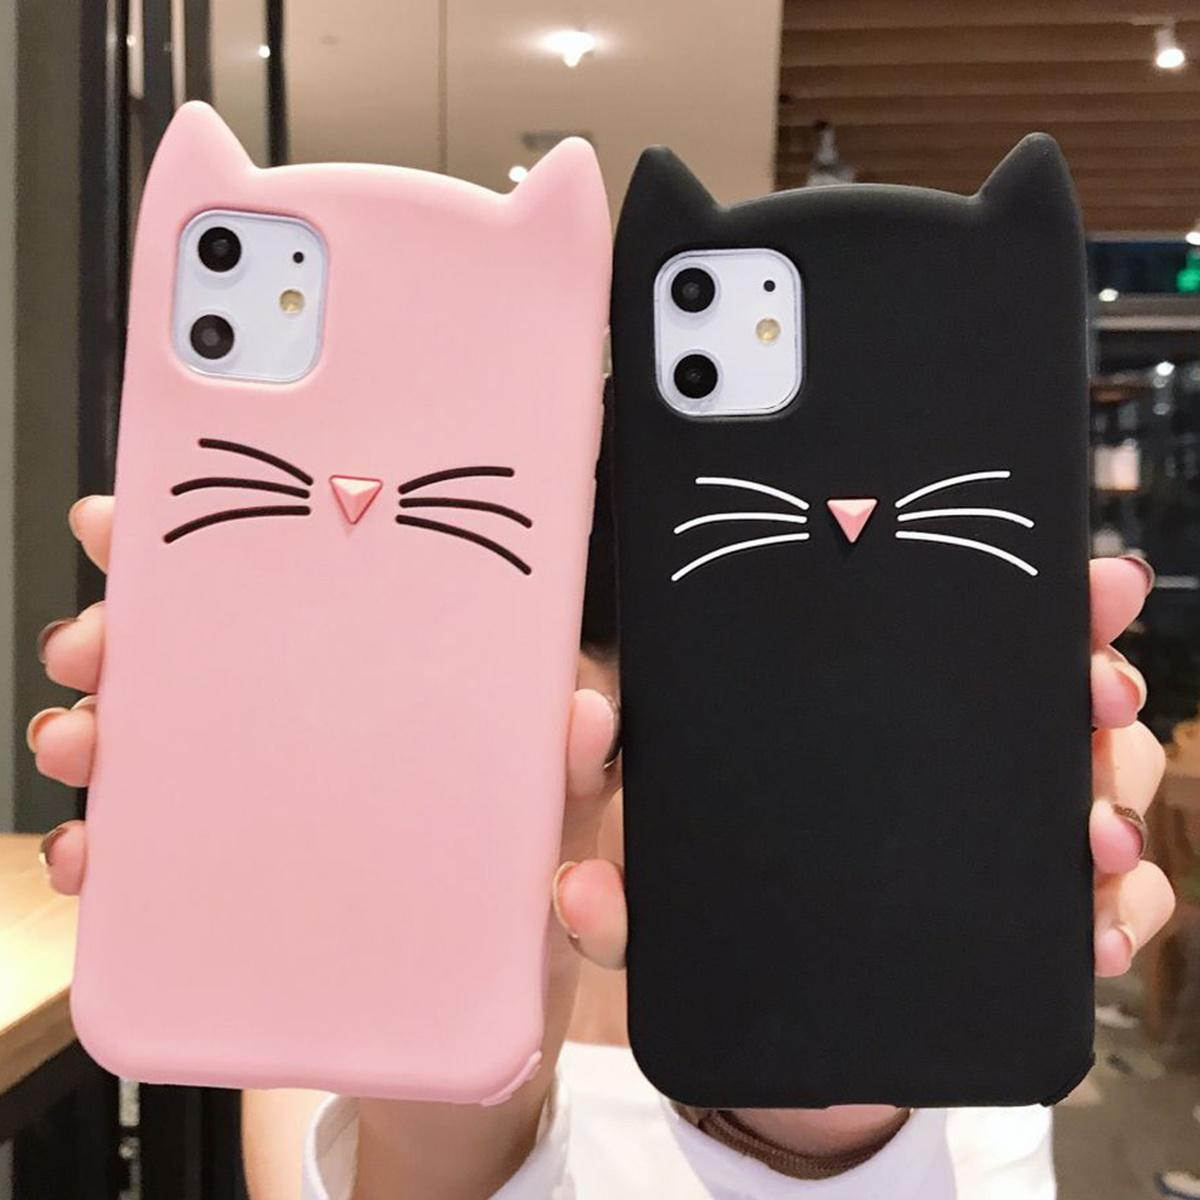 Oído de la manera linda de la caja del gato para el iPhone XS XR 11 Pro MAX 7 8 Plus TPU de silicona cubierta trasera Coque